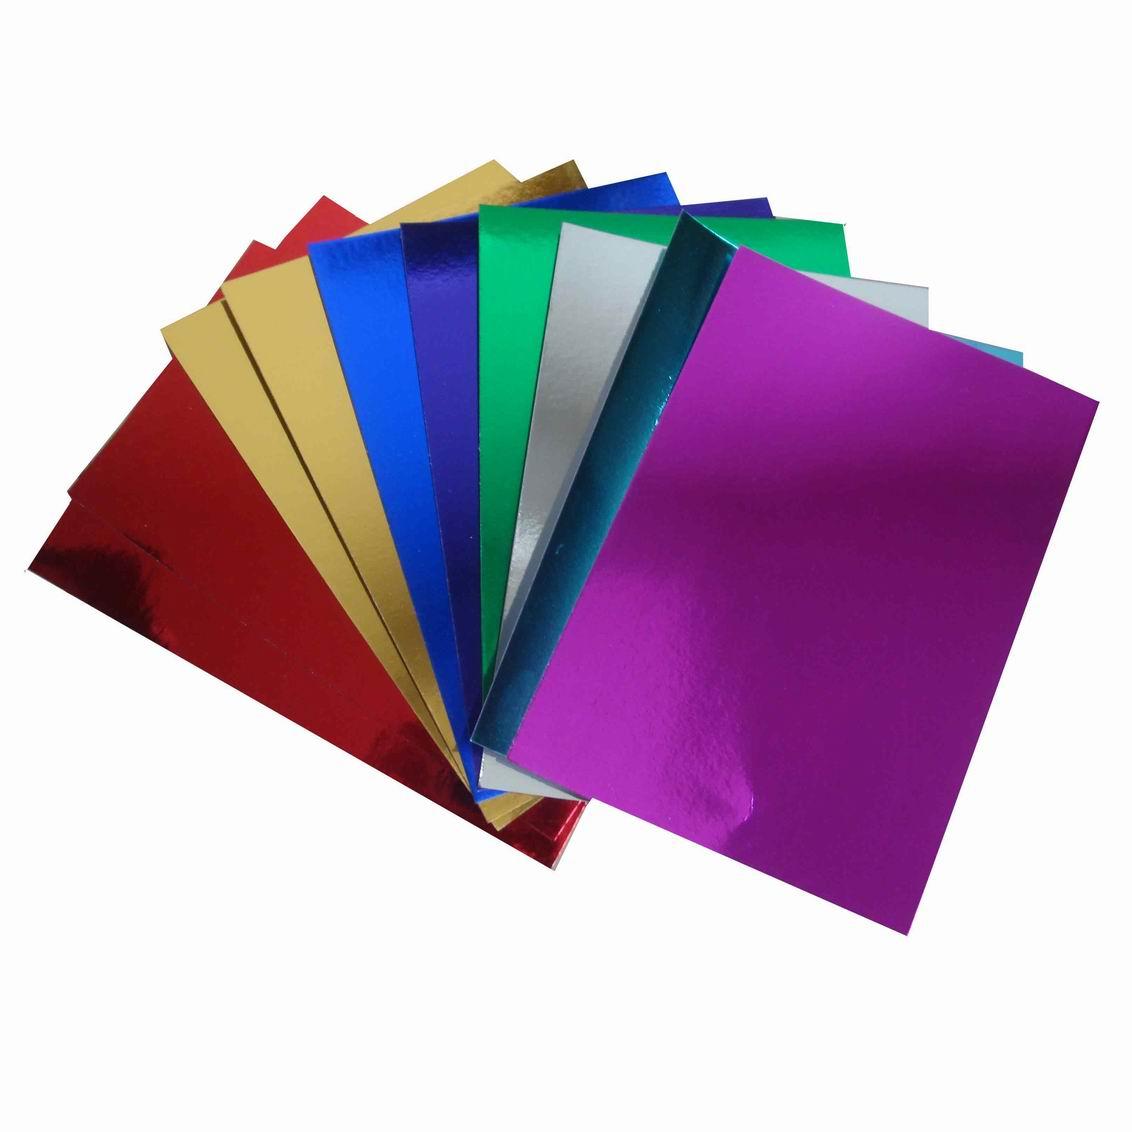 Hunan Raco Enterprises Co Ltd Metallic Paper And Cardboard